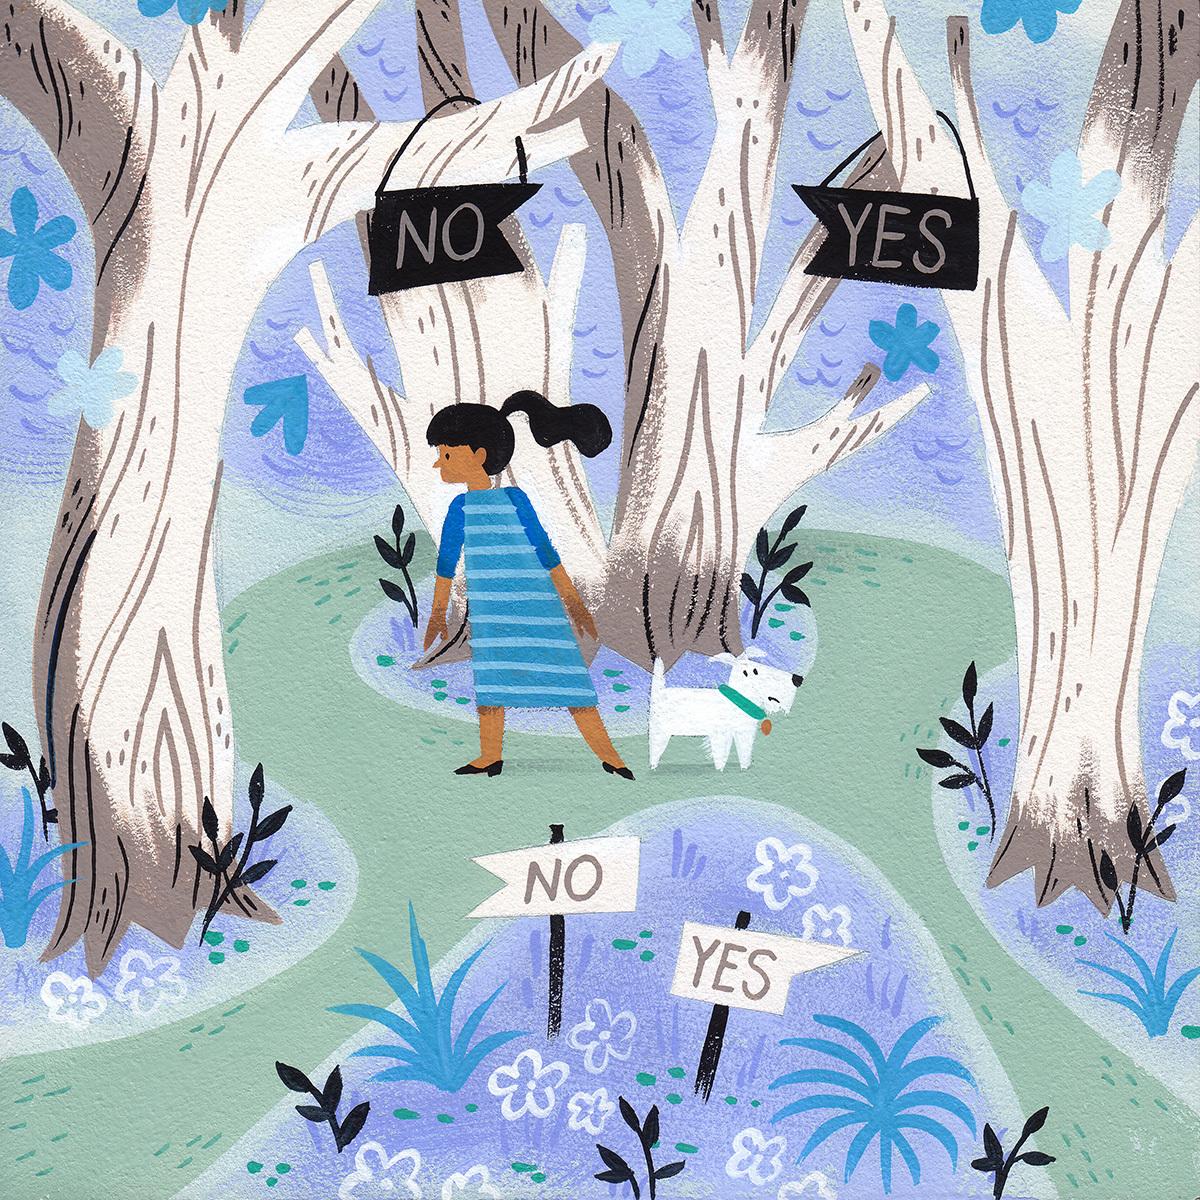 Illustration by Ellen Surrey, via The New Yorker.